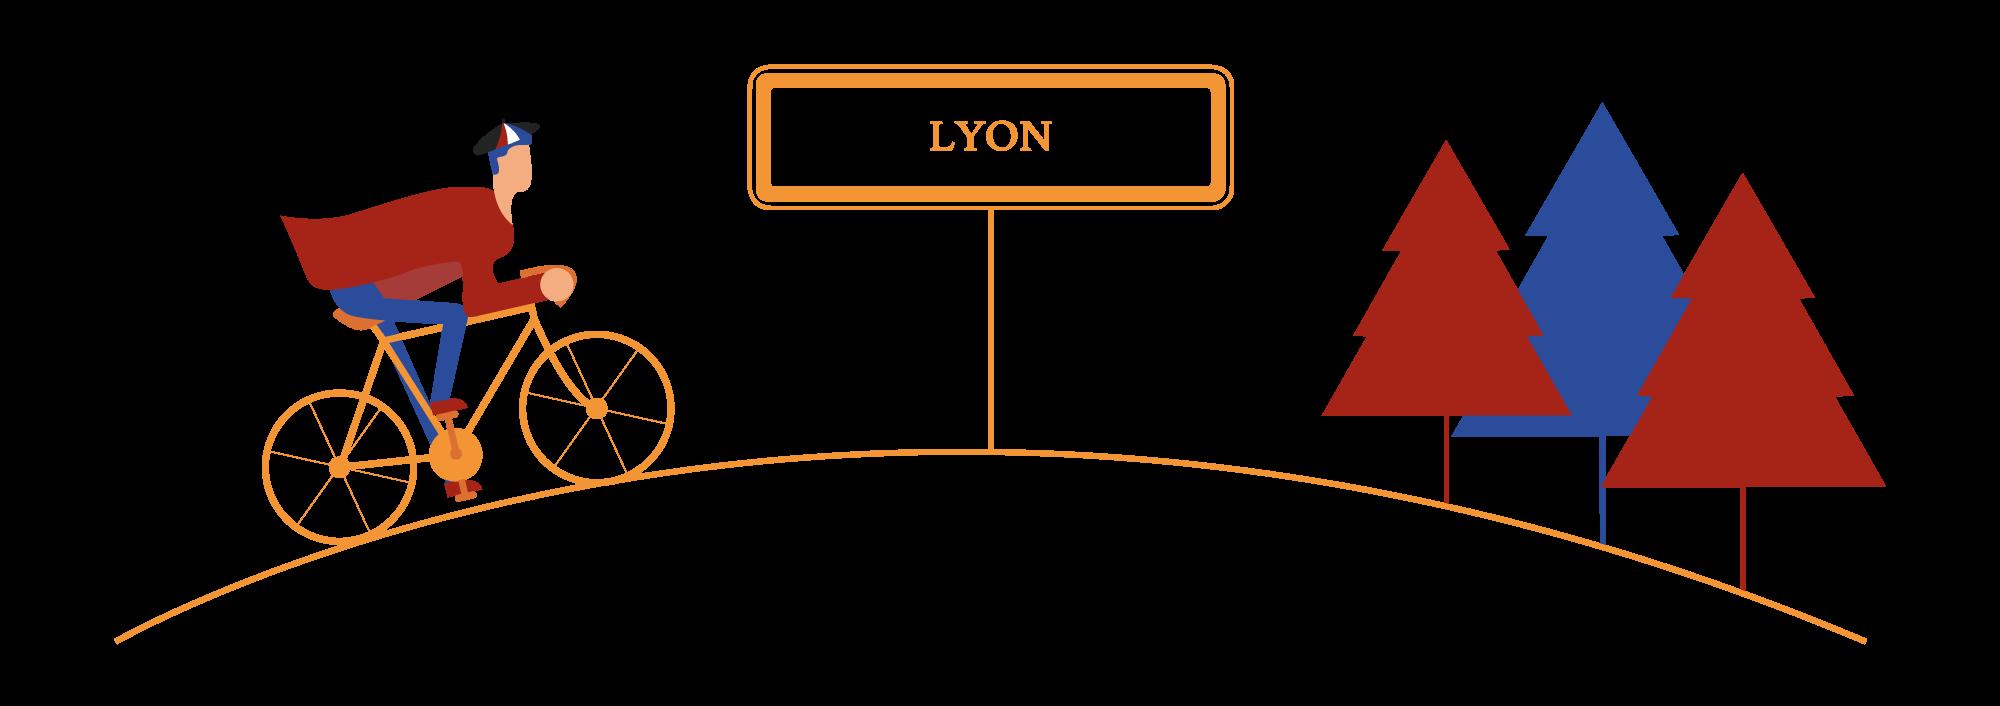 spécialités de Lyon